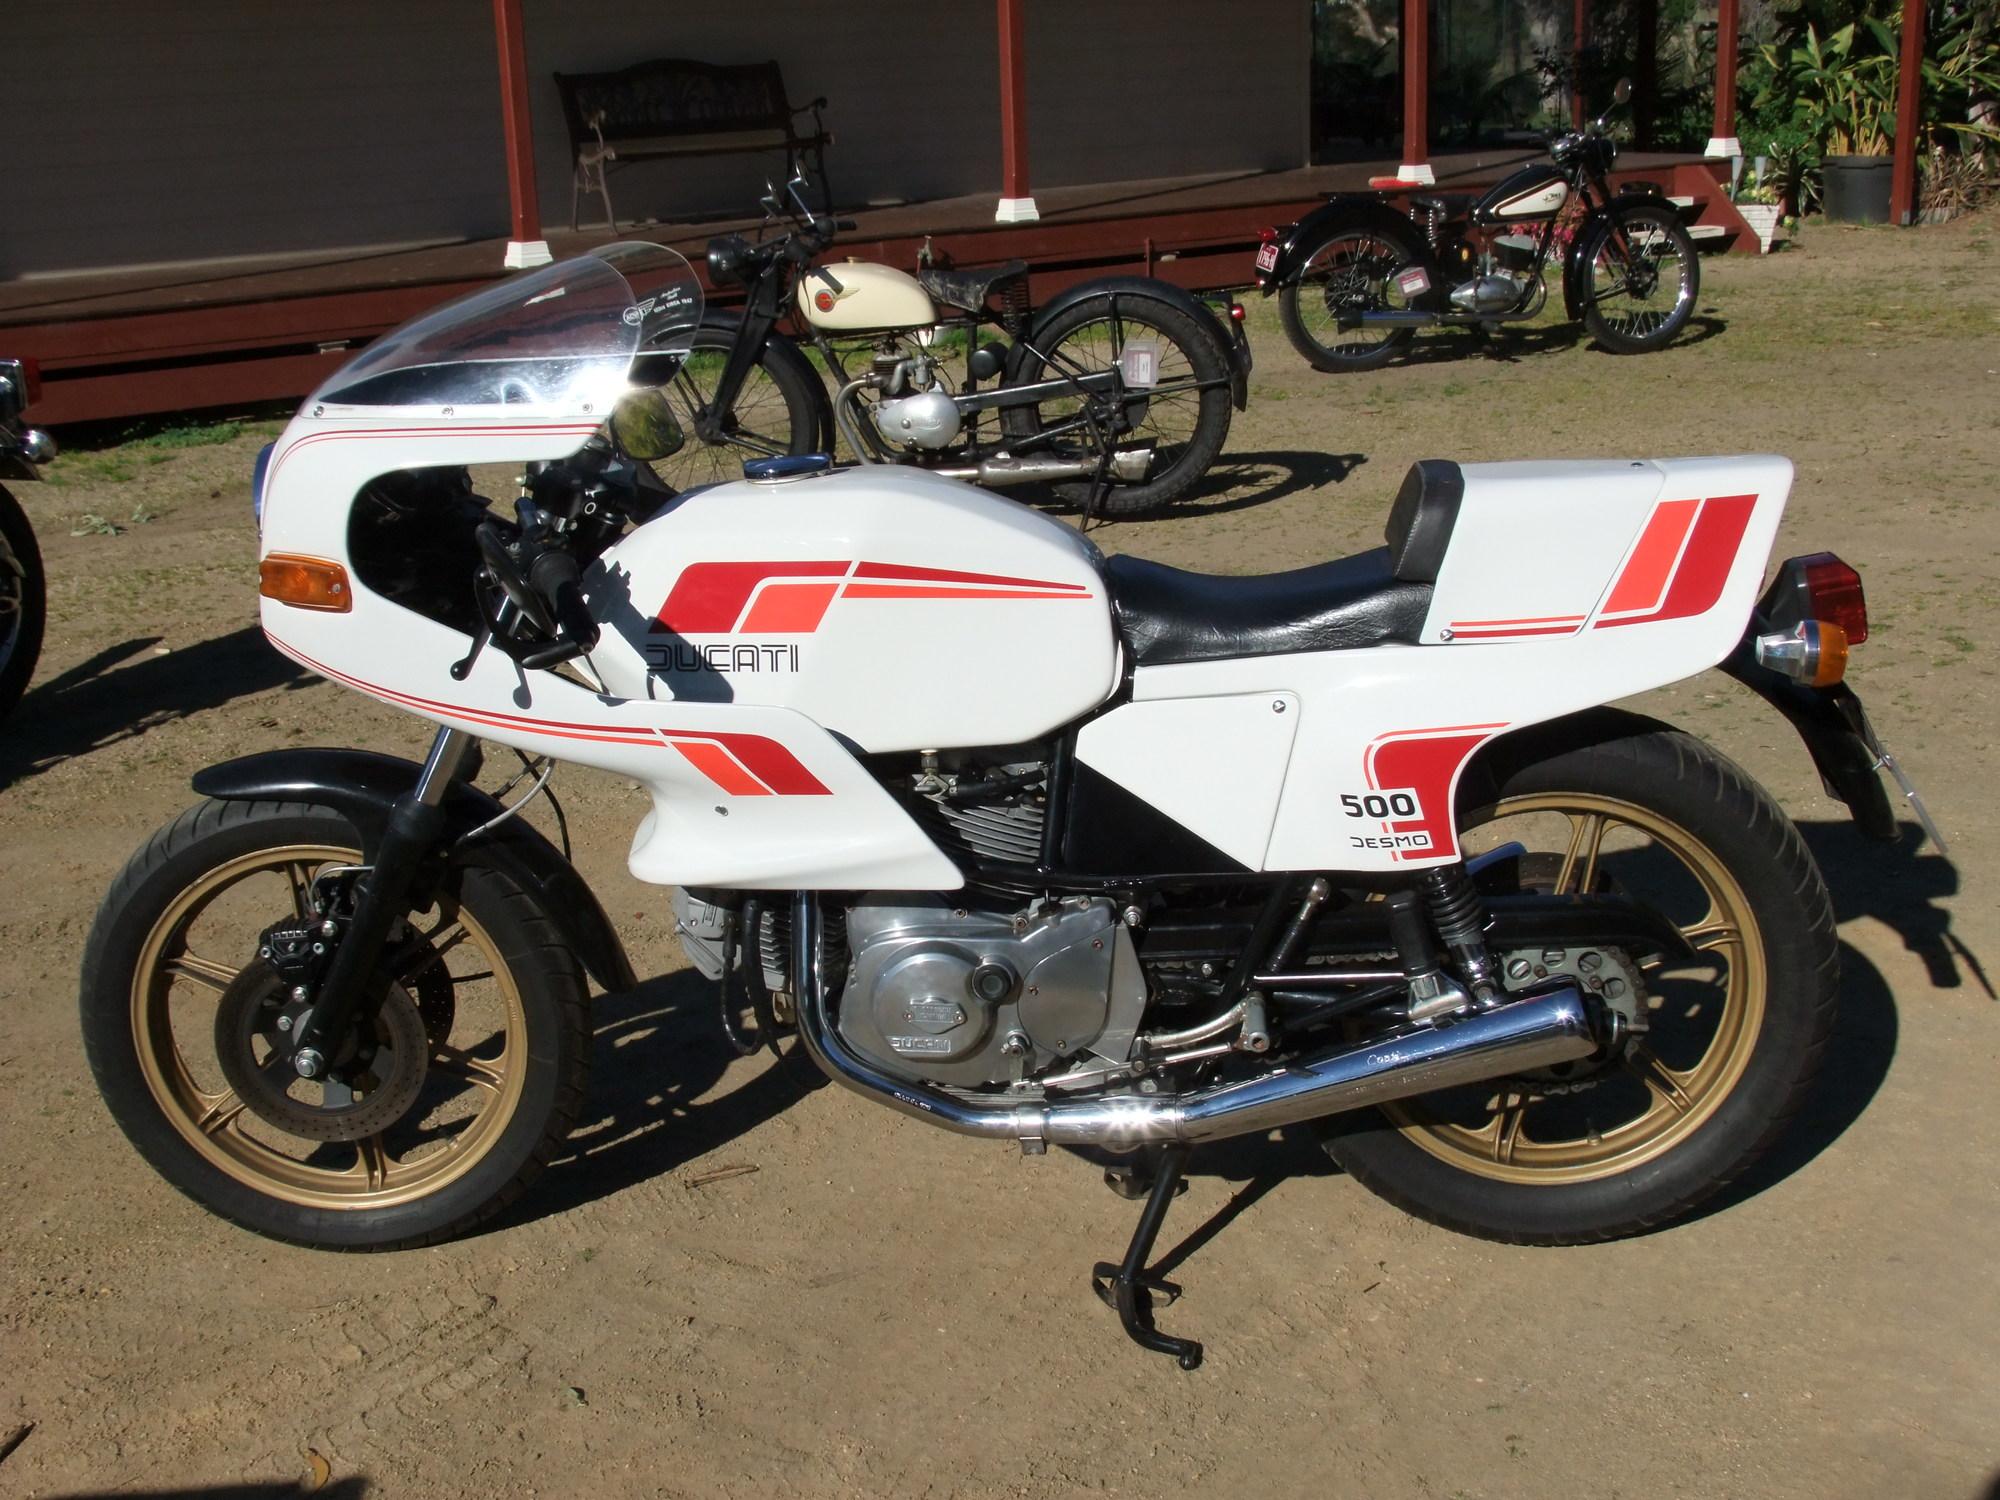 rsz_1982_500cc_ducati_pantah.jpg